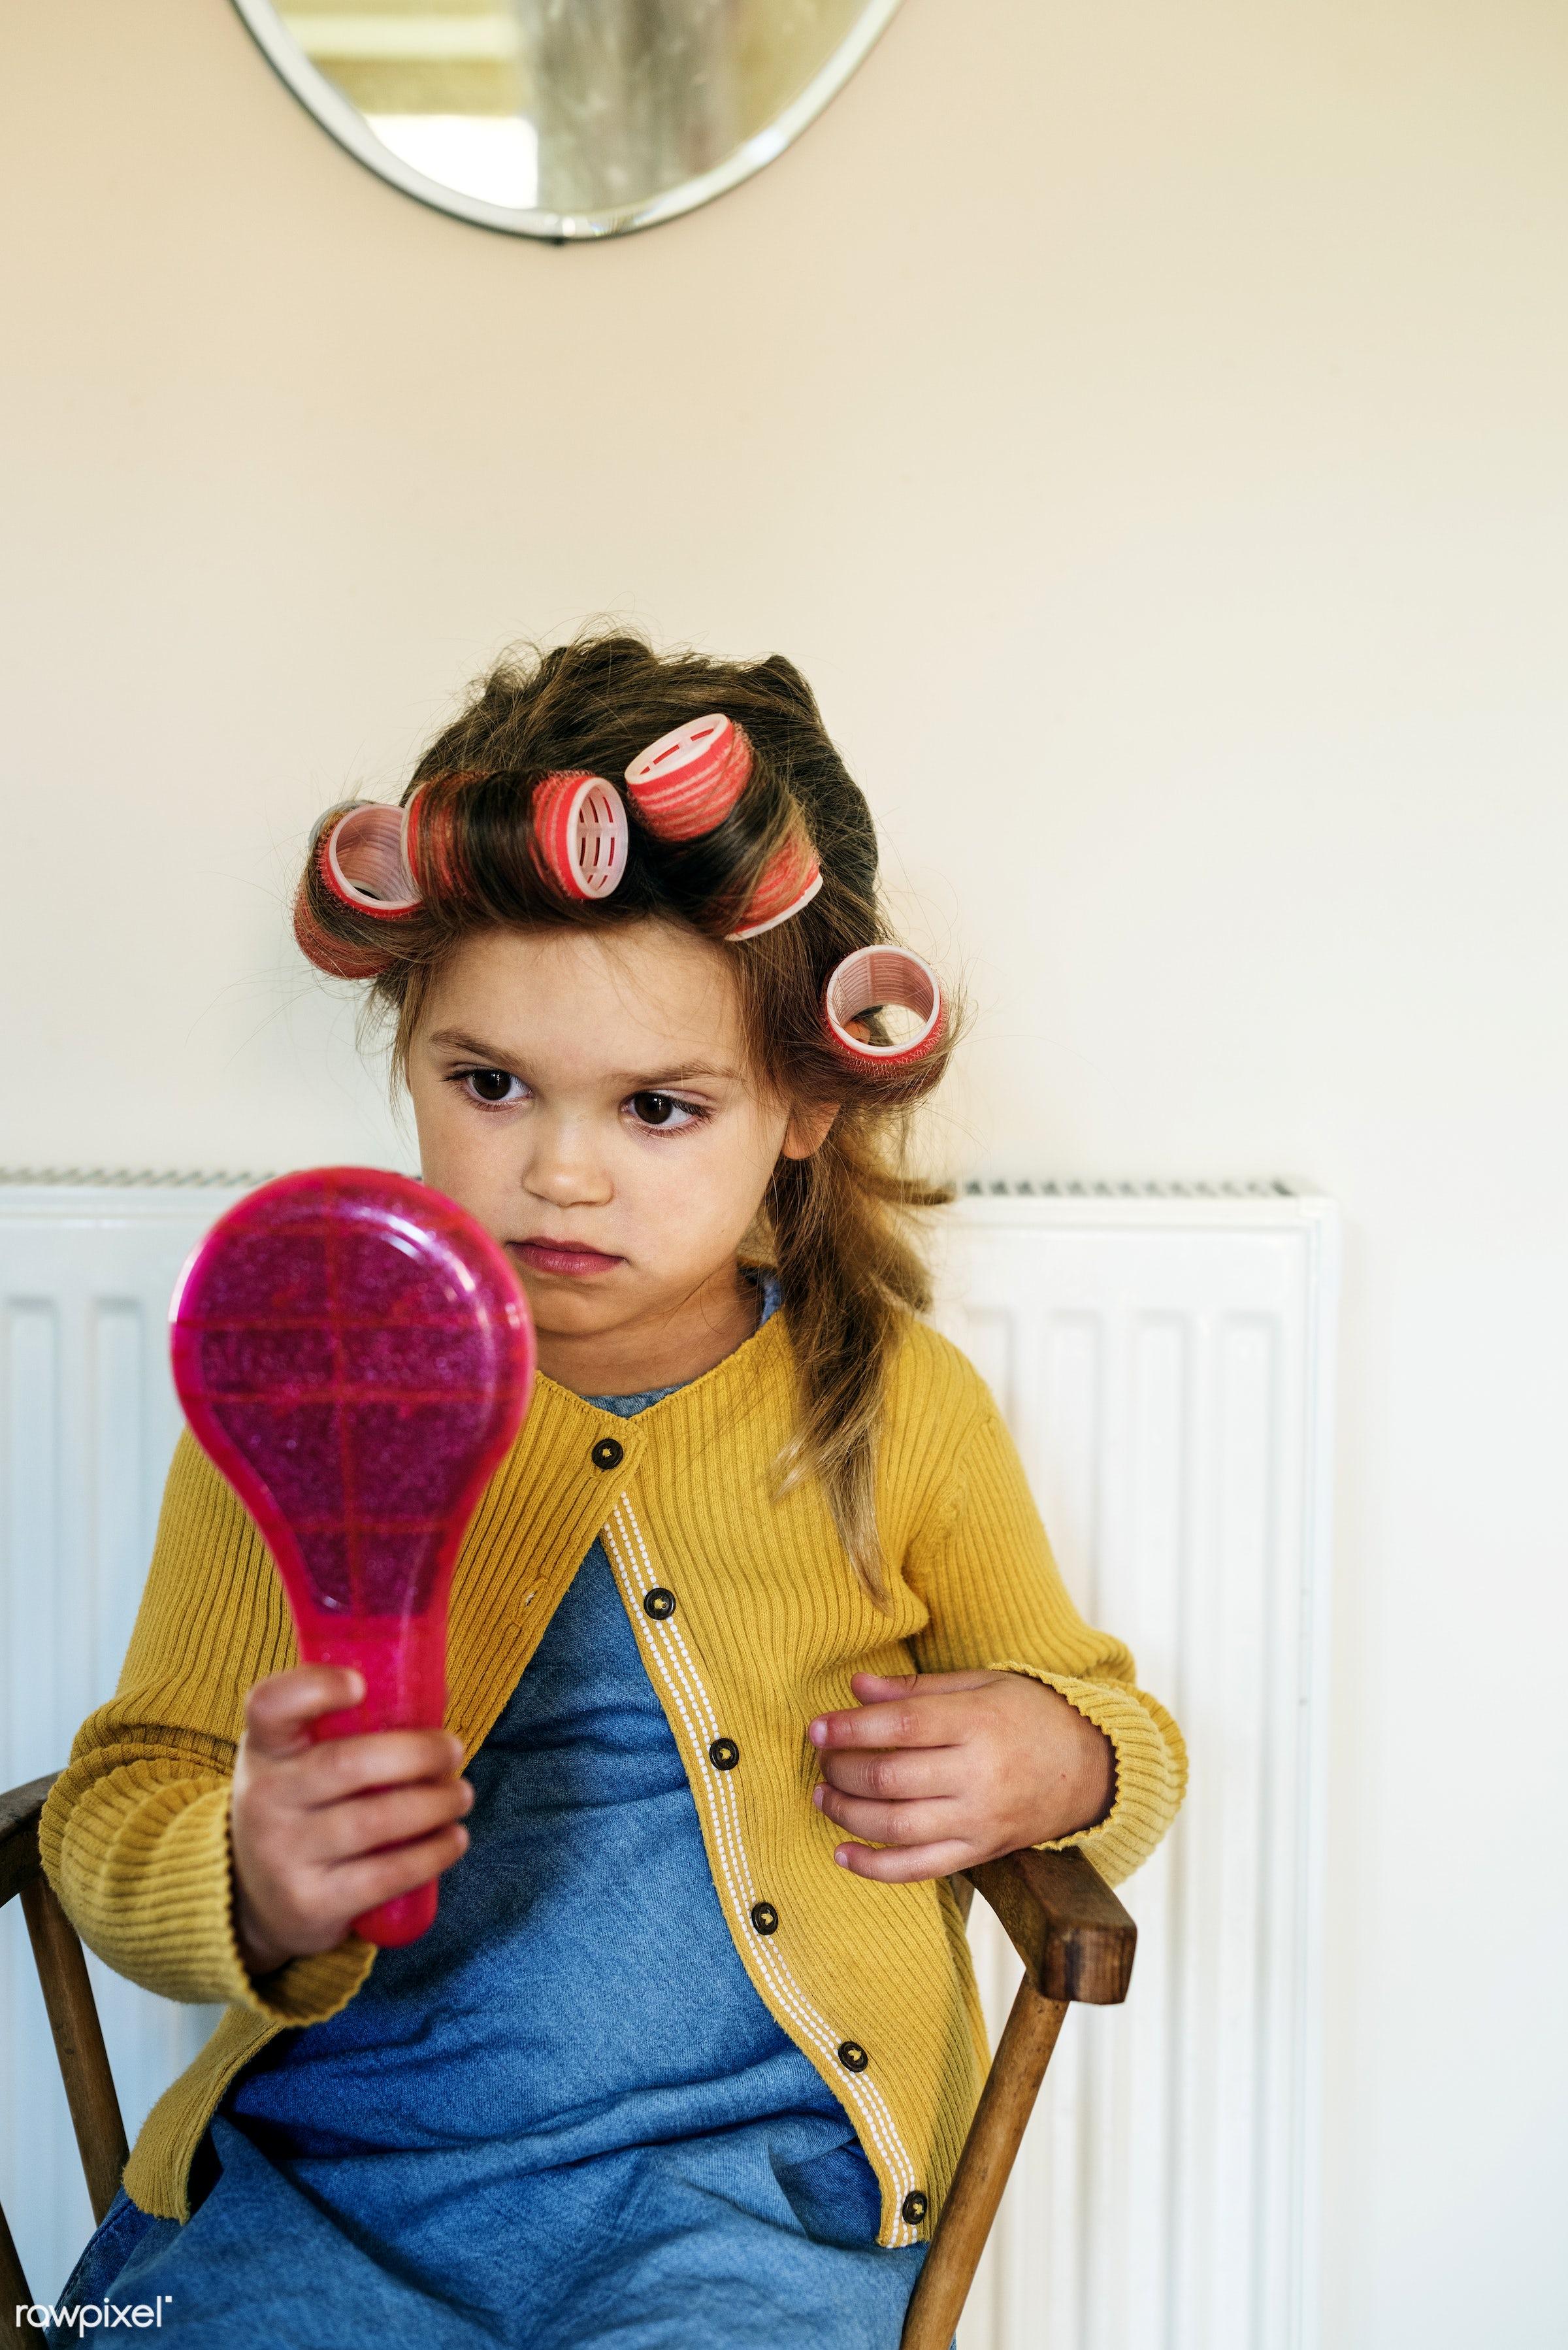 salon, doll, dress up, modern, adorable, baby, beautiful, beauty, cape, charming, cheerful, child, childhood, children,...